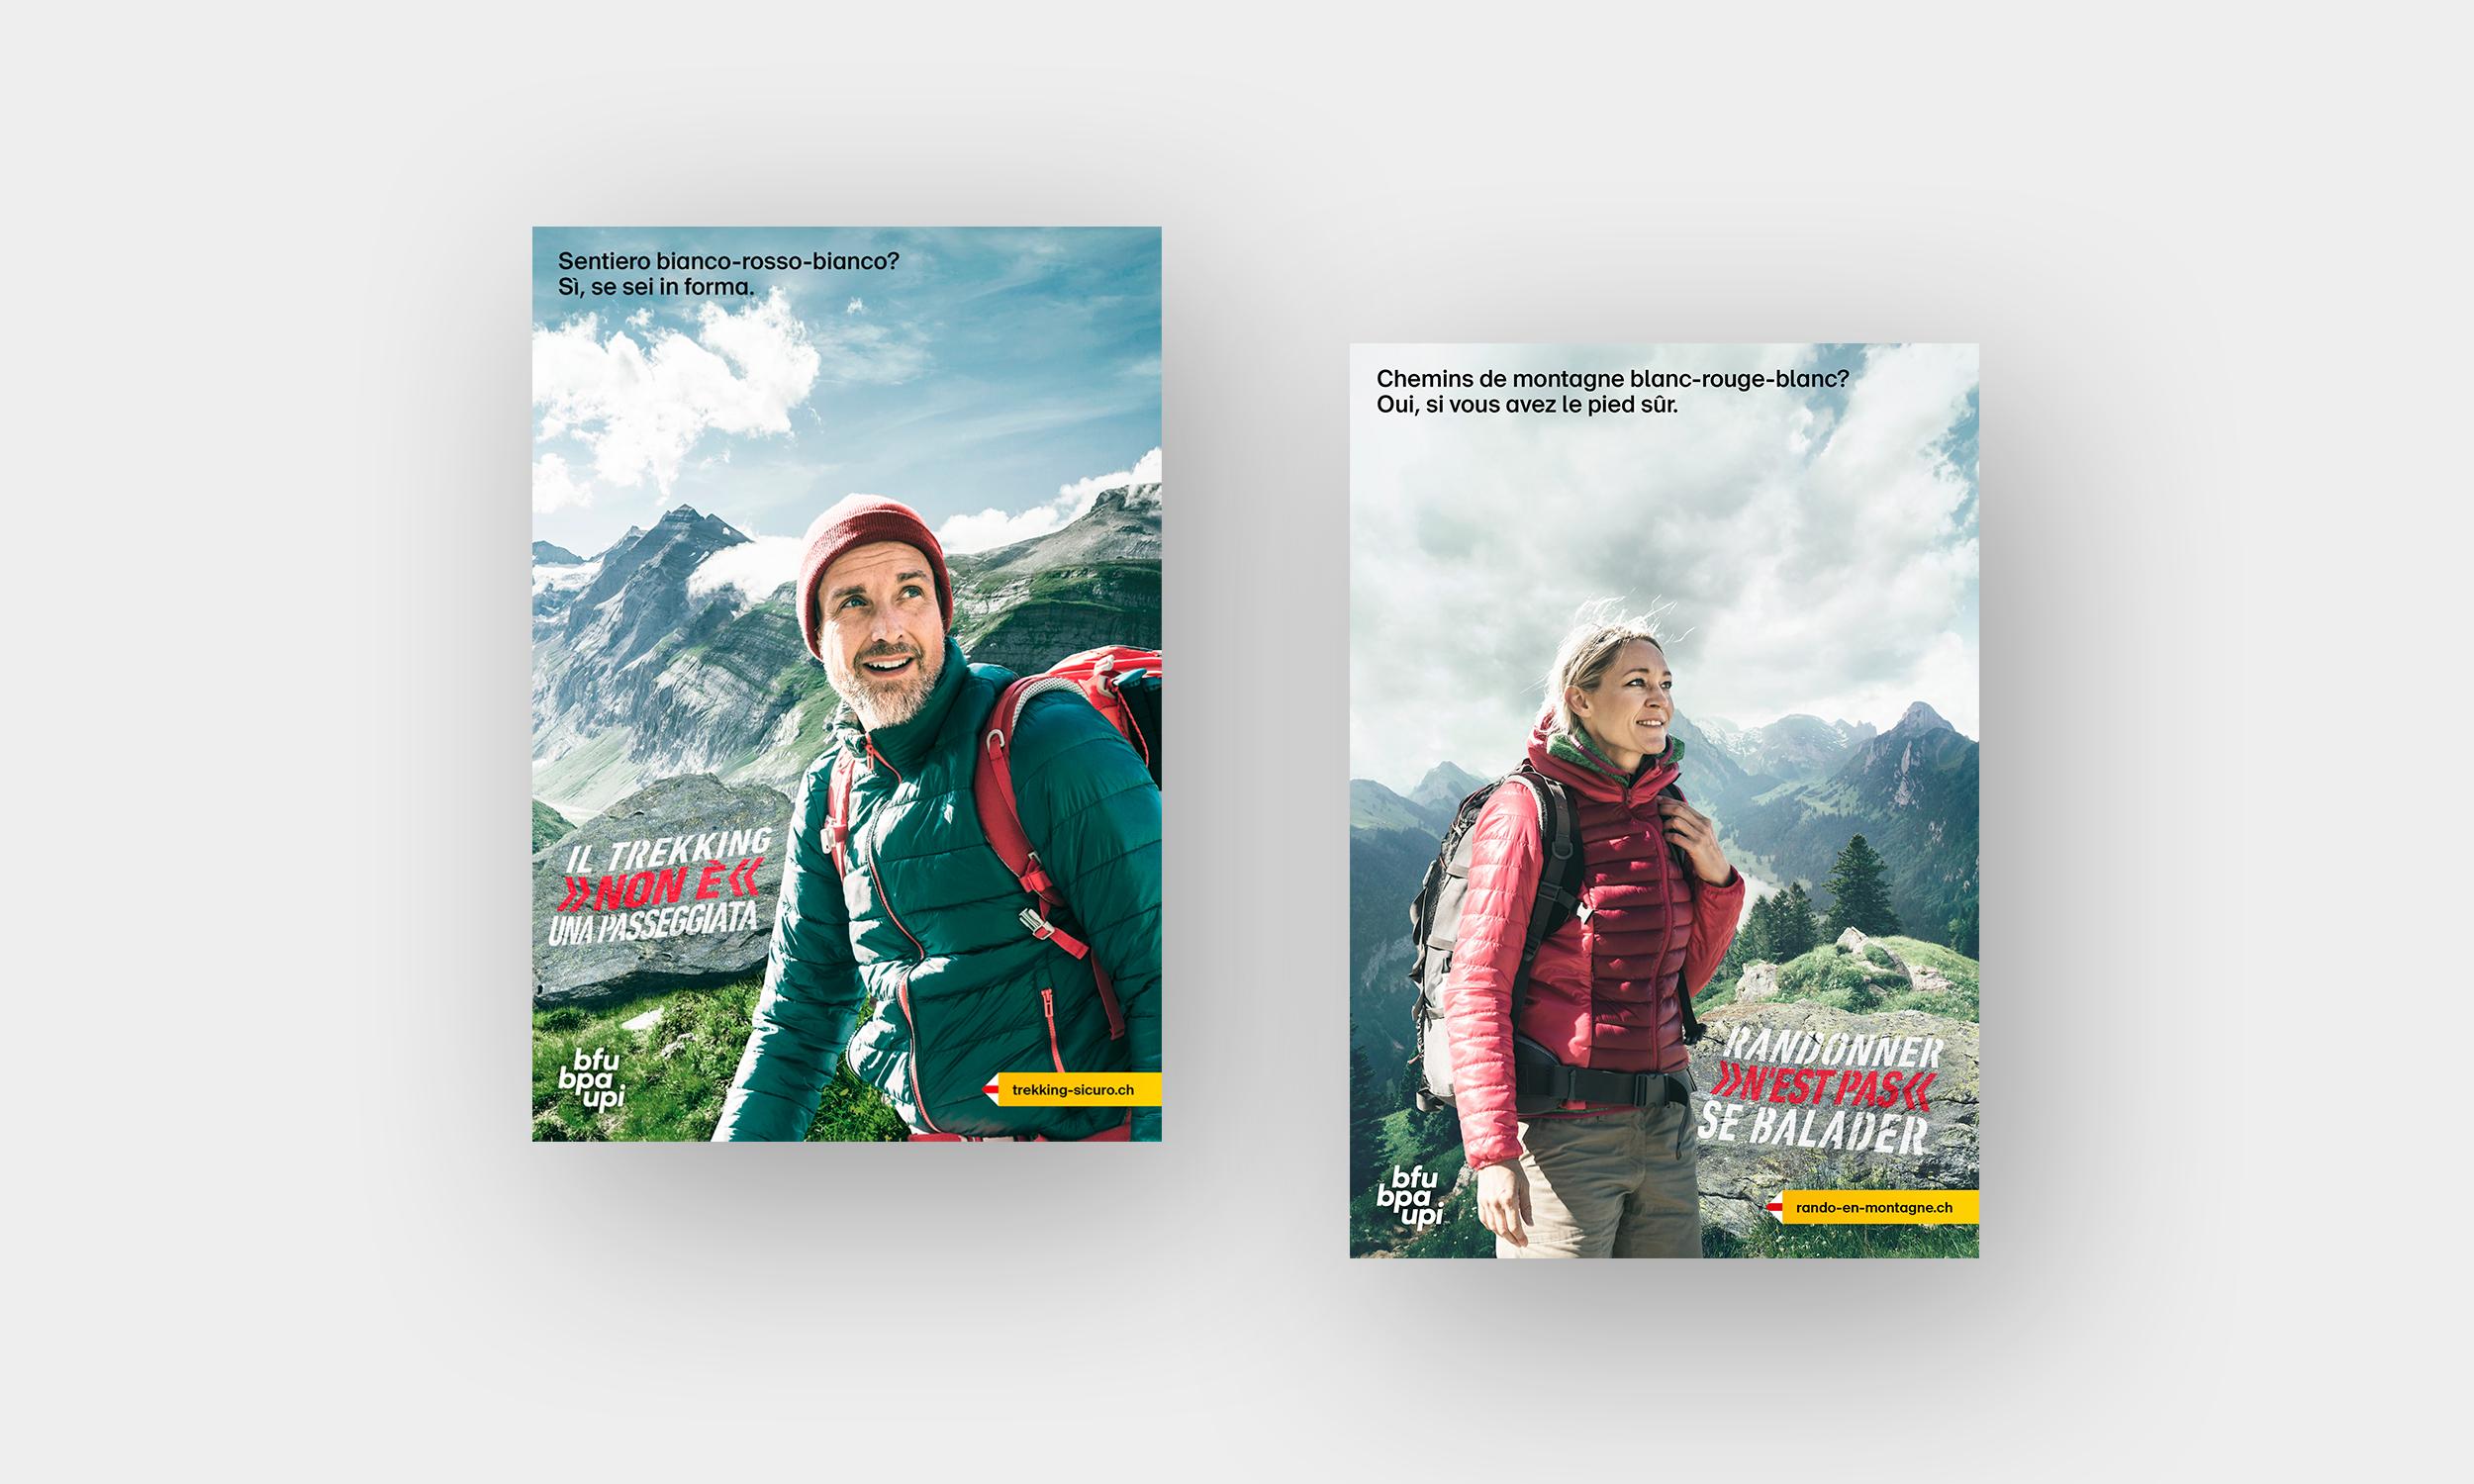 BFU_Bergwandern_Case_SujetsHoch_3200px